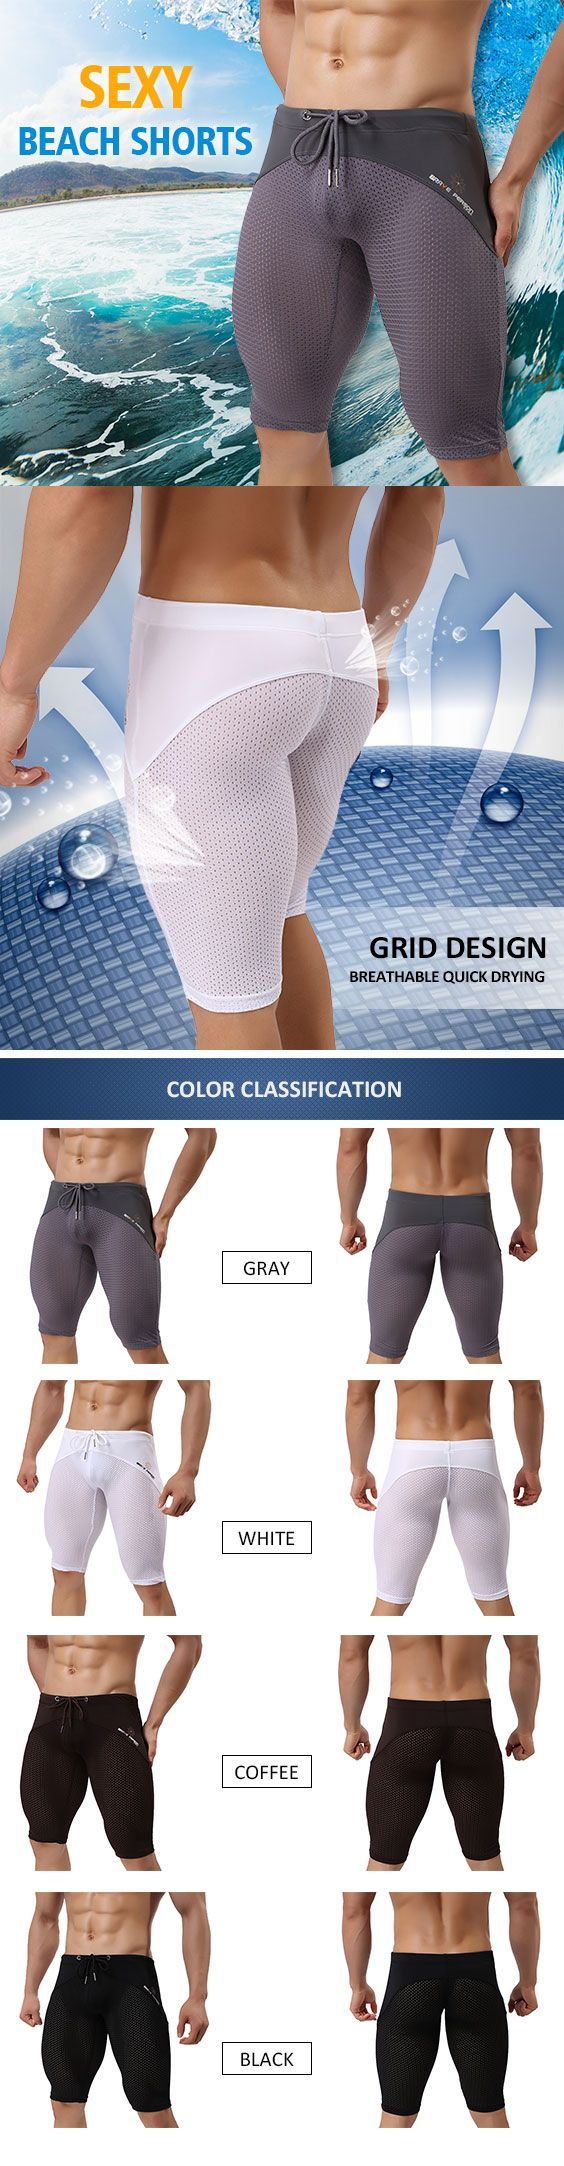 Sexy Sport Beach Swimming Surf Hot Spring Breathable Mesh Knee Length Trunks for Men